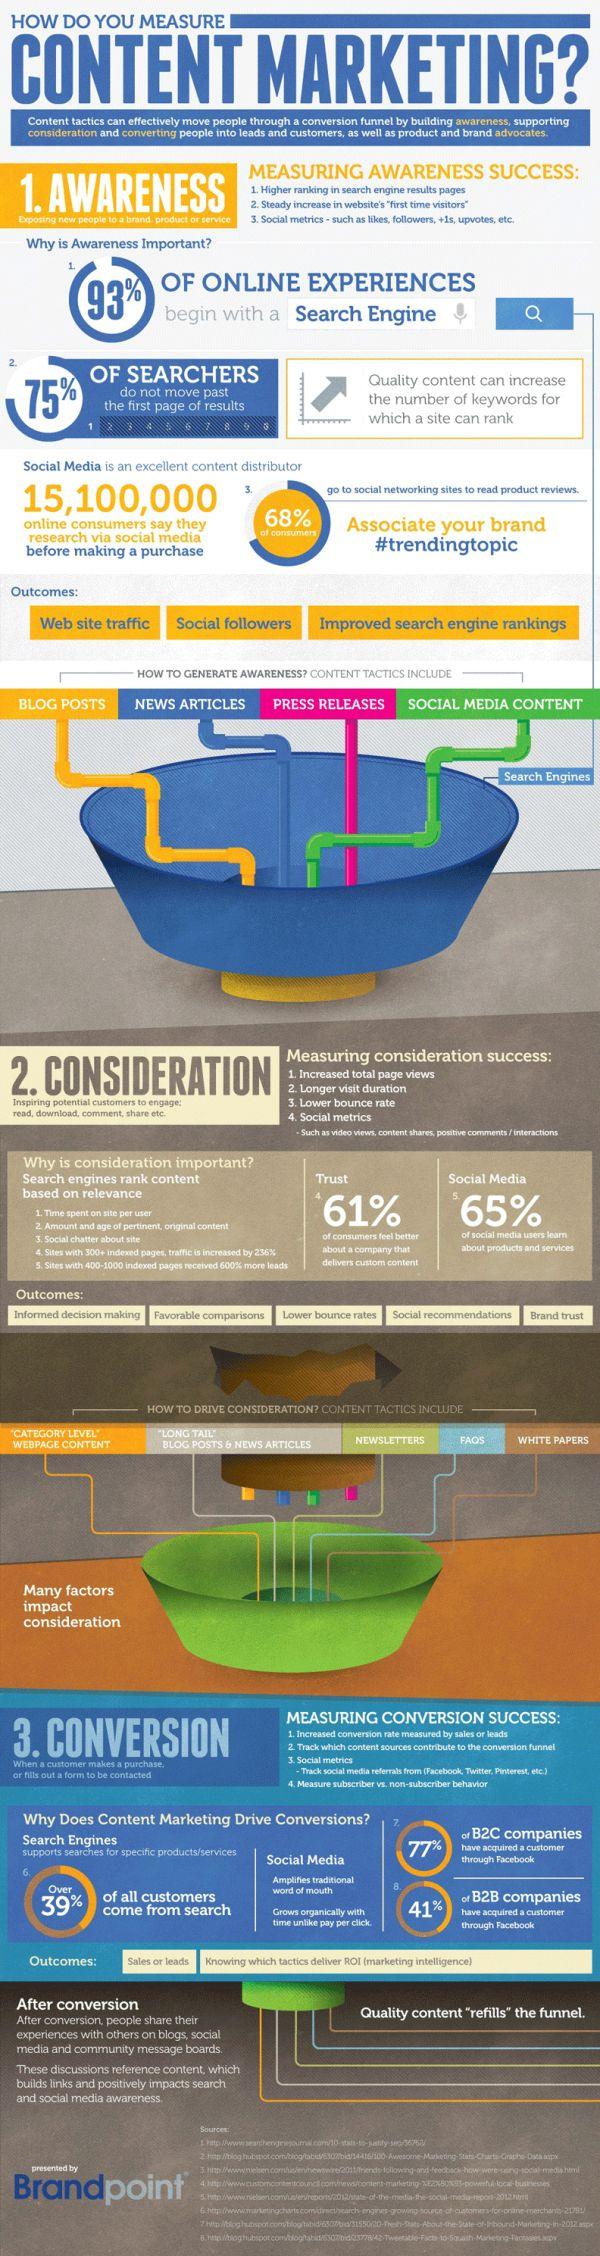 How to measure #Content #Marketing. #infographic via .@alltwtr